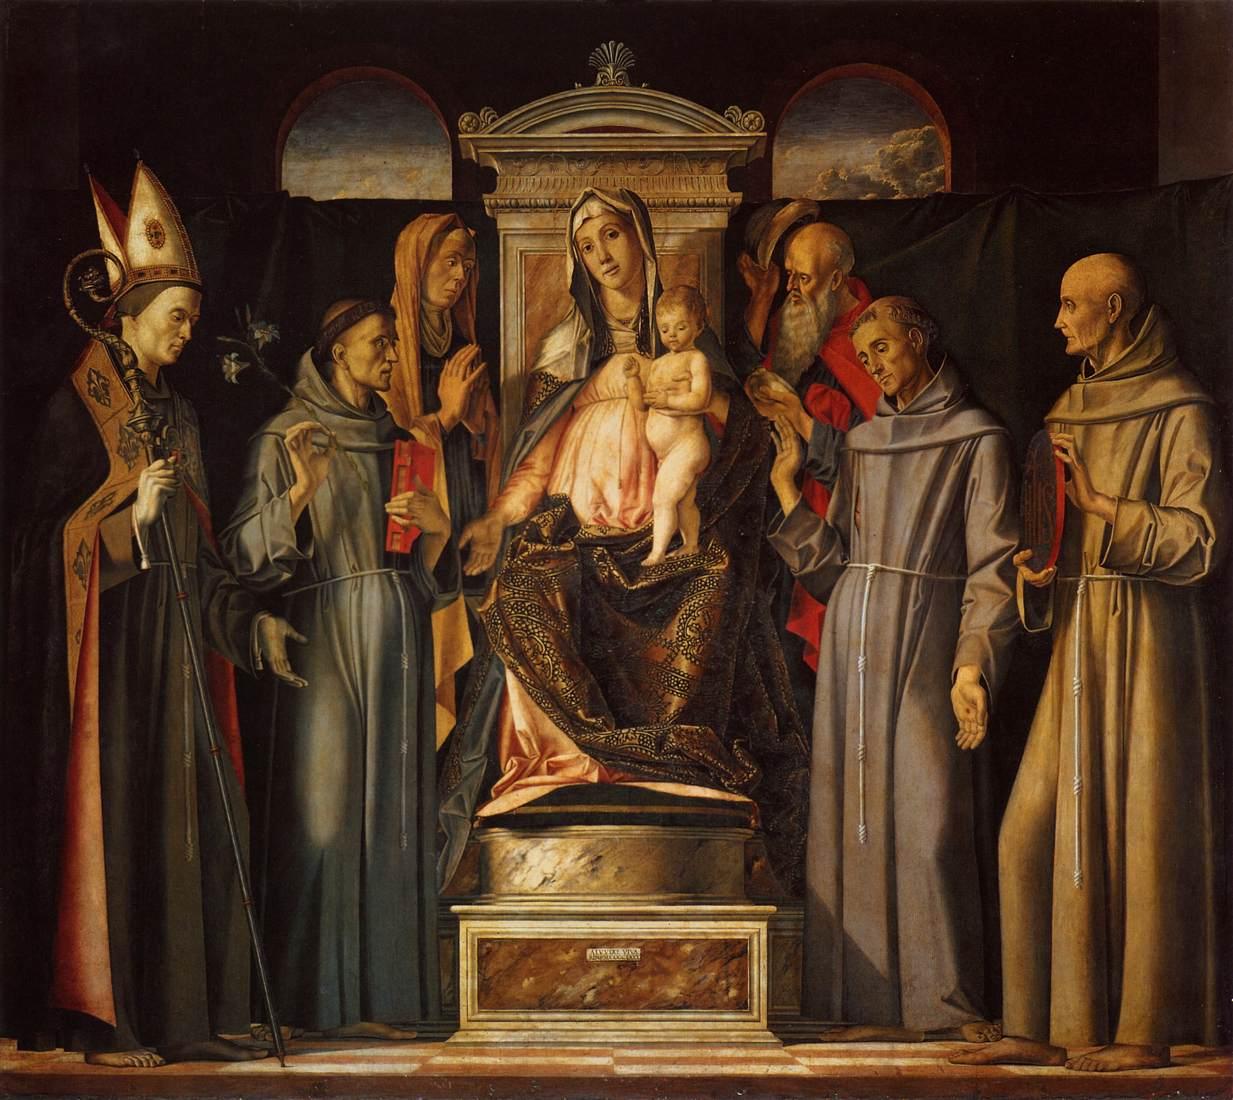 Madonna and Child with Saints by Alvise Vivarini